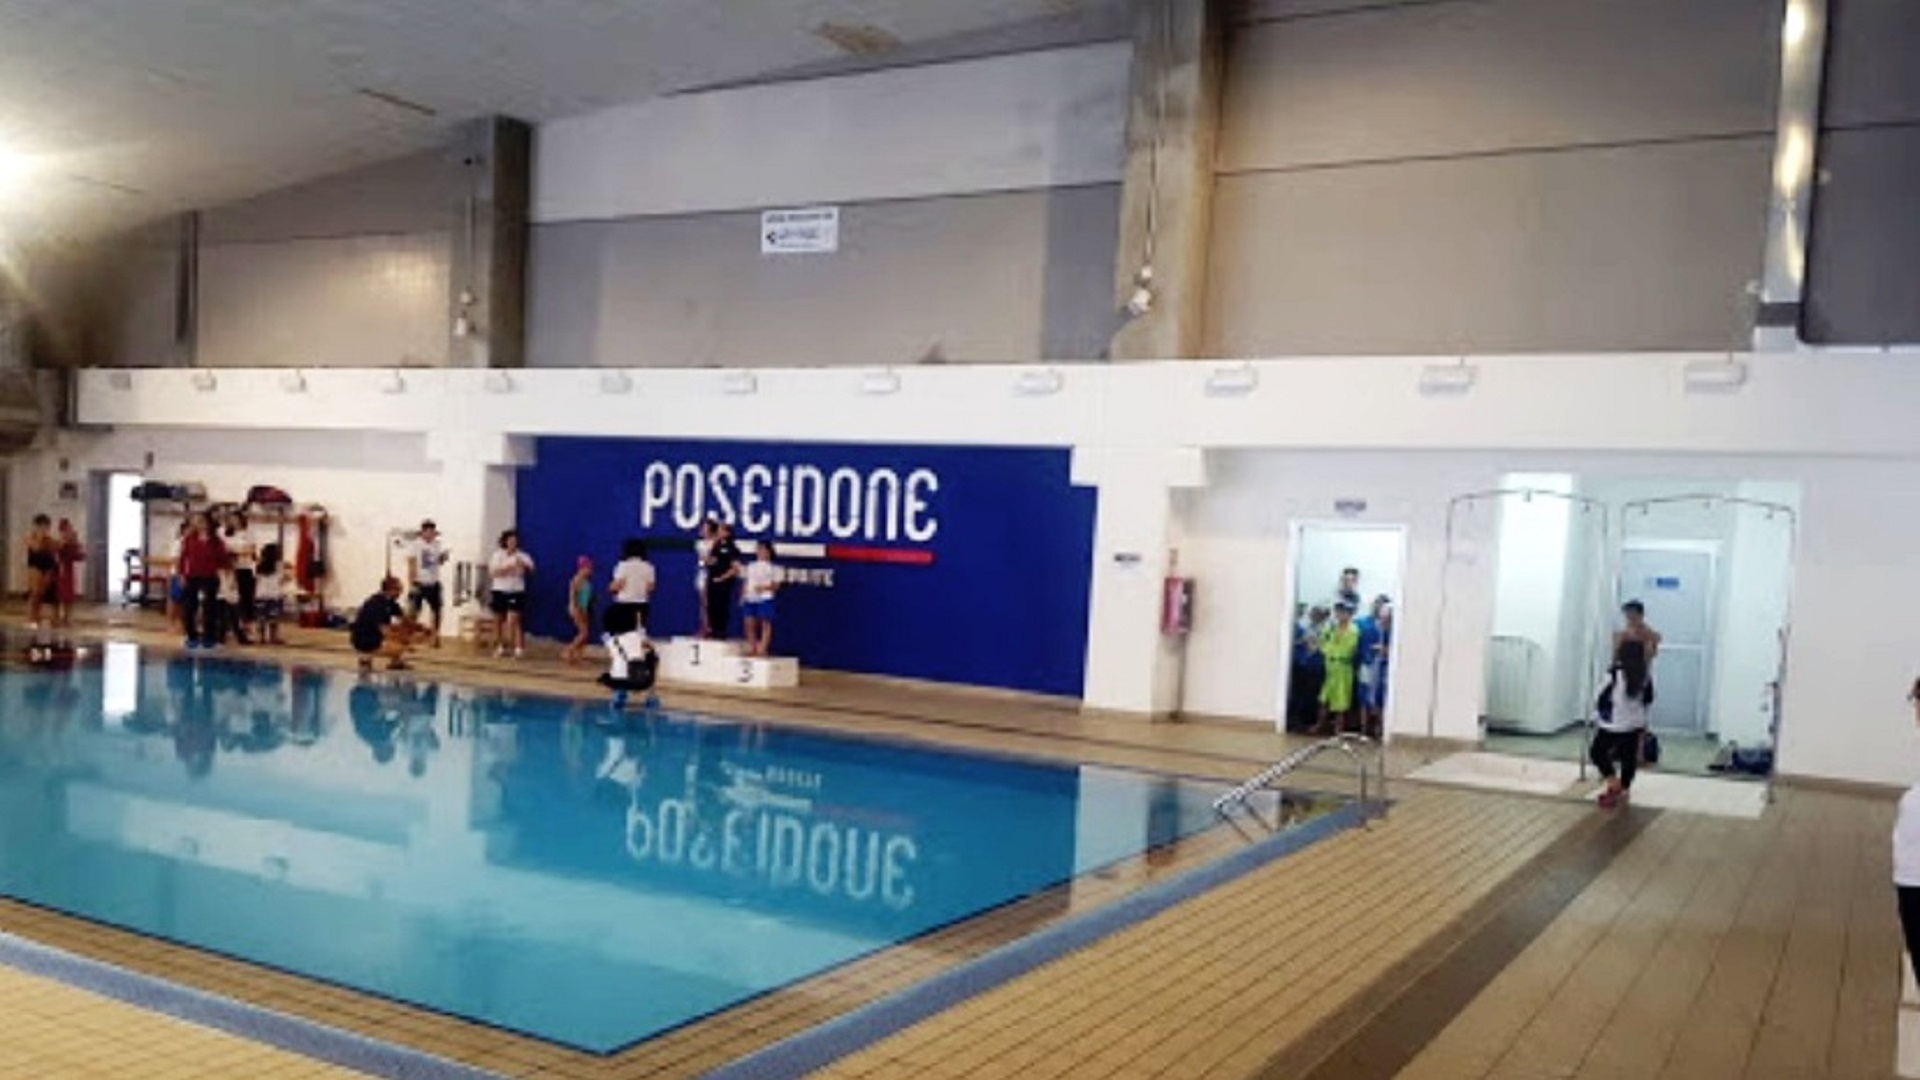 piscina poseidone sito